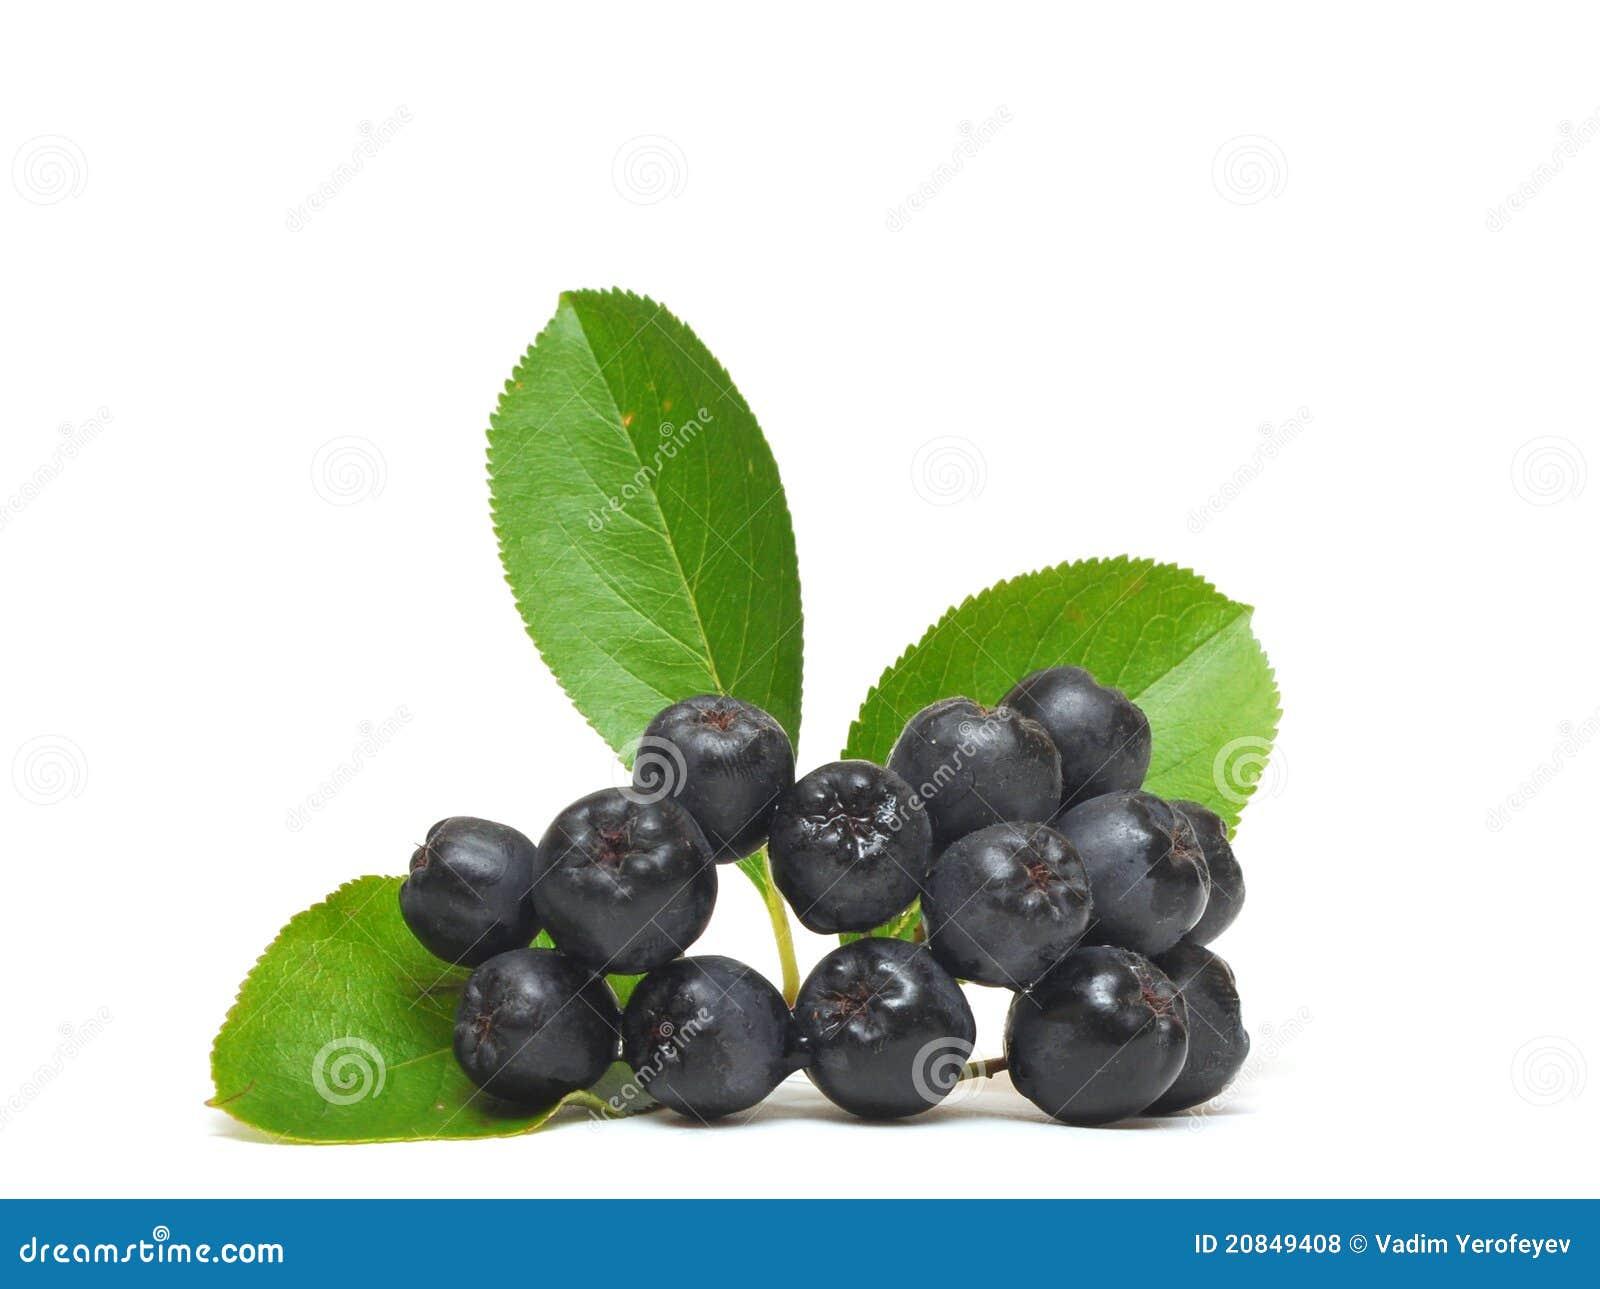 black chokeberry royalty free stock photos image 20849408. Black Bedroom Furniture Sets. Home Design Ideas